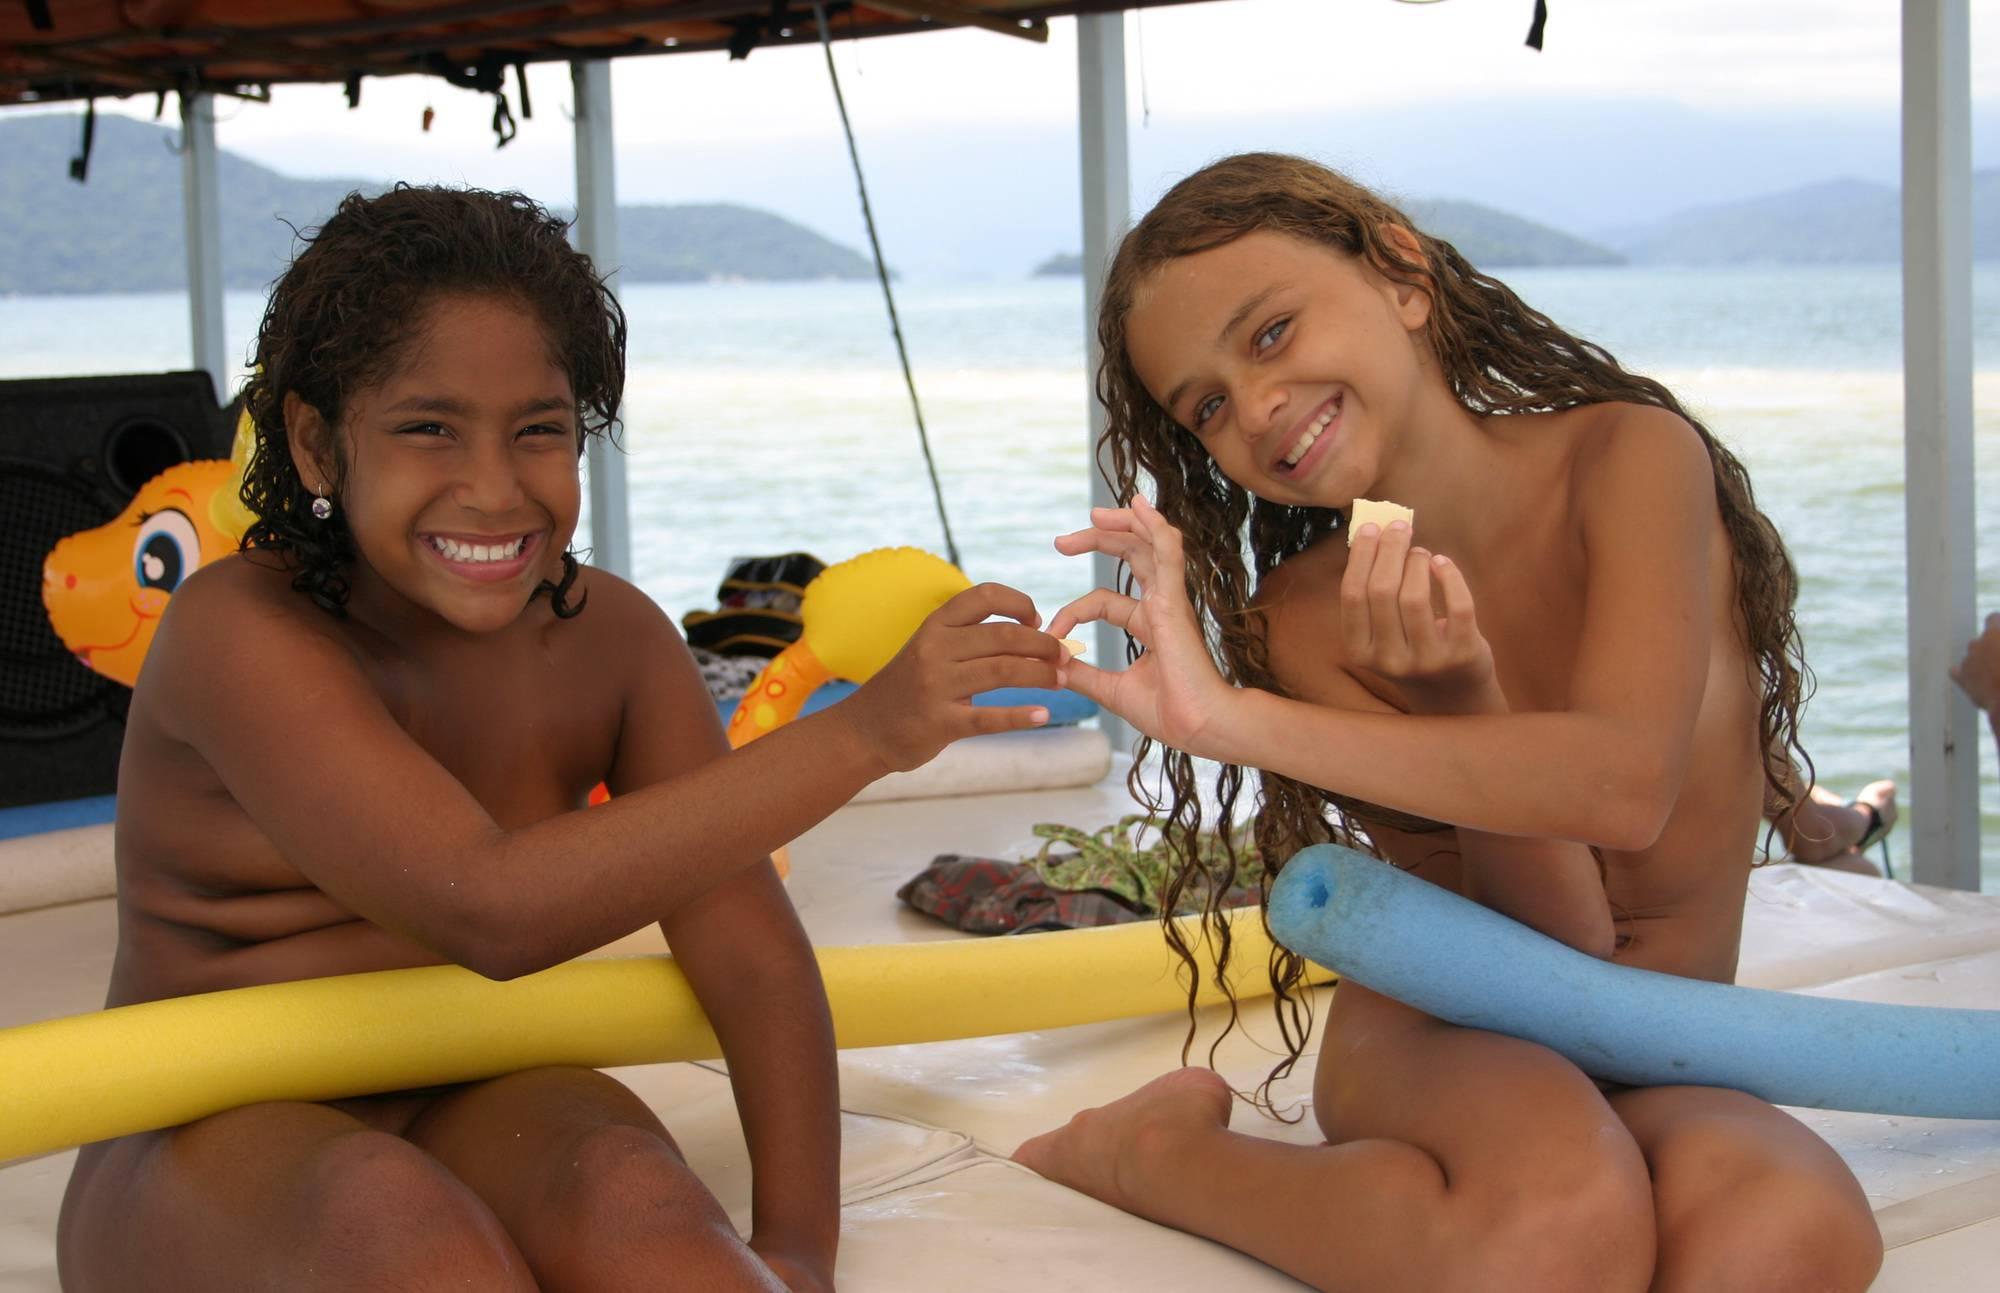 Nudist Photos Brazilian Boating Girlfriend - 1